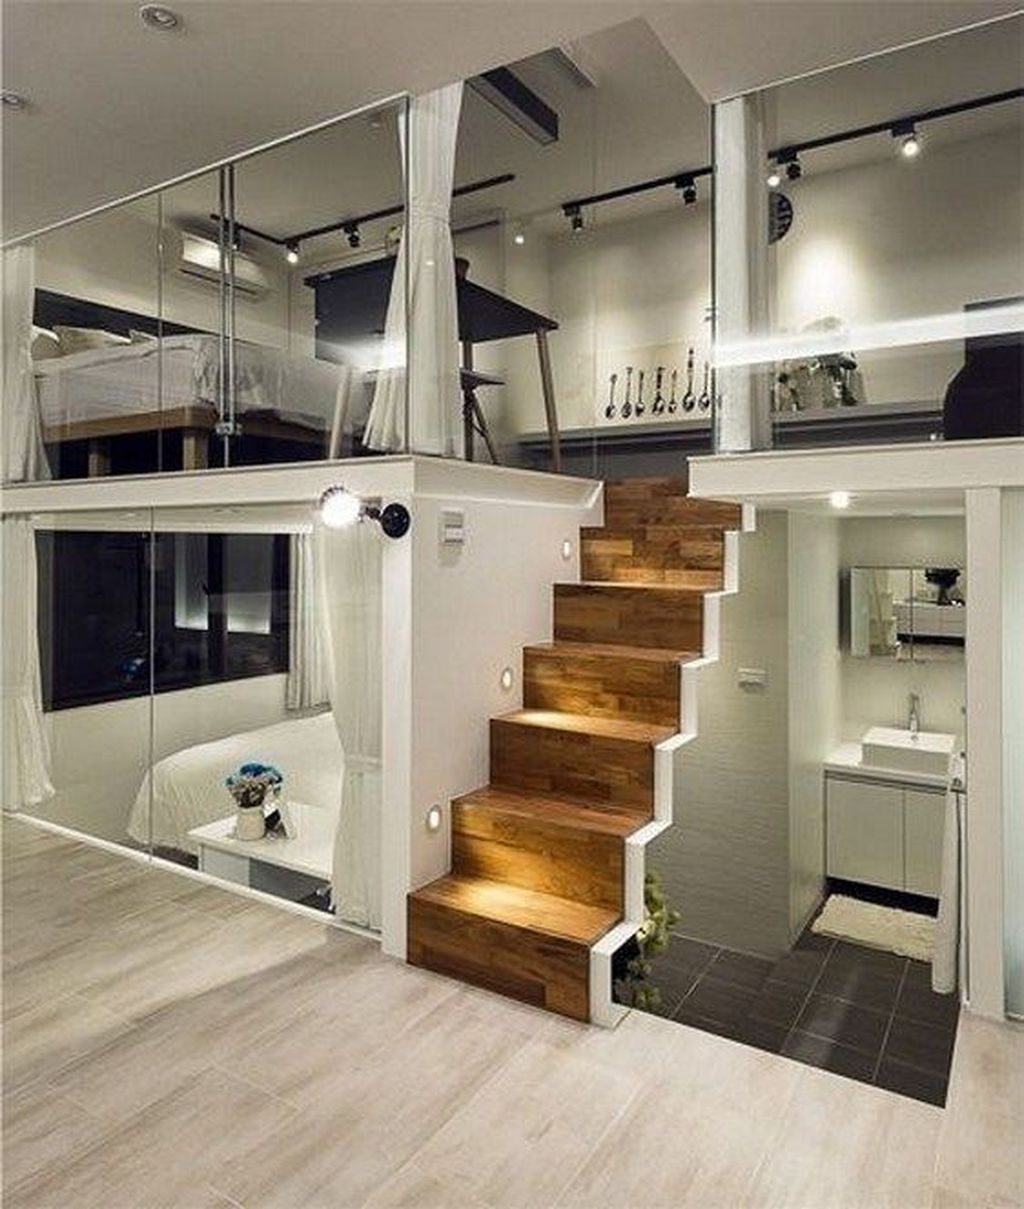 34 Nice Tiny House Design Ideas Tiny House Interior Design Loft